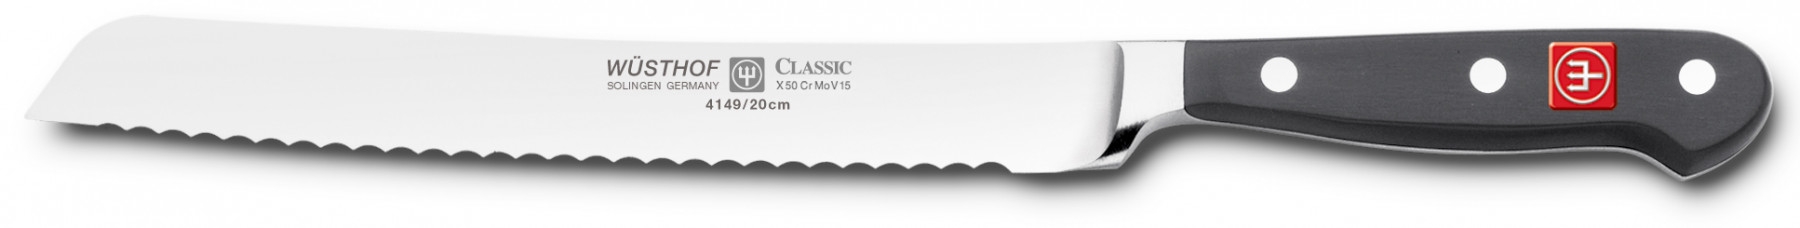 Wüsthof Dreizack Classic Brotmesser 20cm